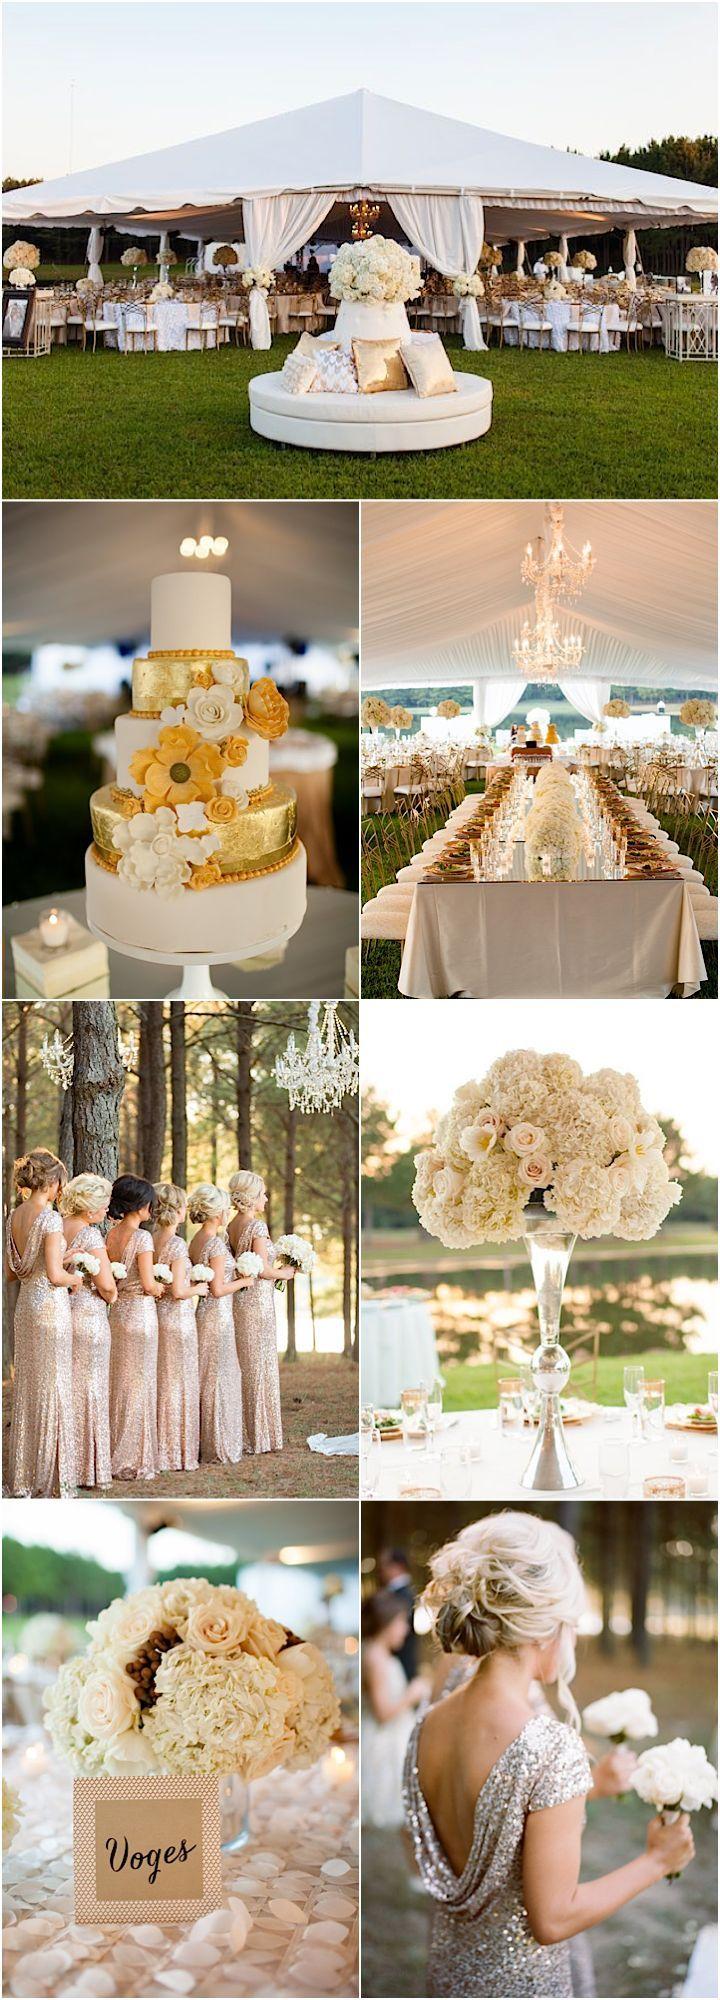 Featured Photographer: Archetype Studios; gorgeous wedding reception details